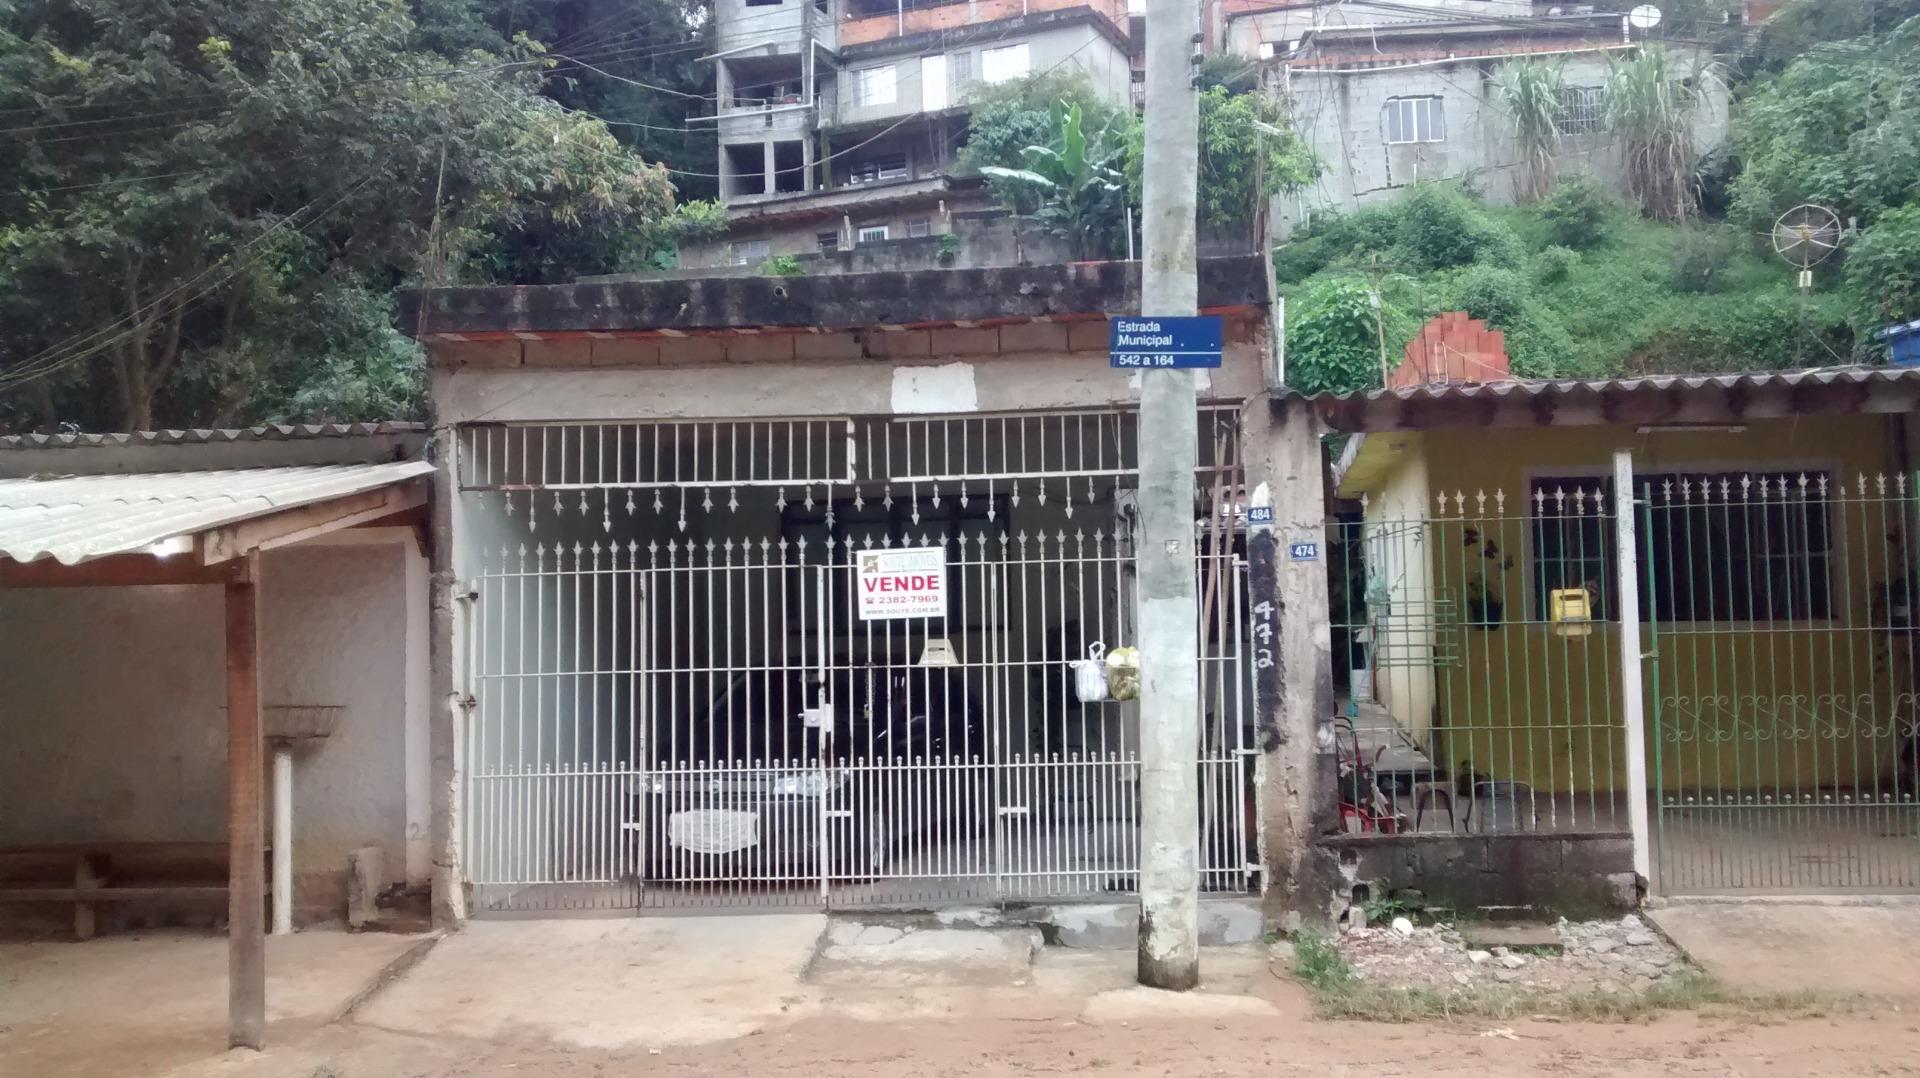 Soute Imóveis - Casa, Jardim Doraly, Guarulhos - Foto 2